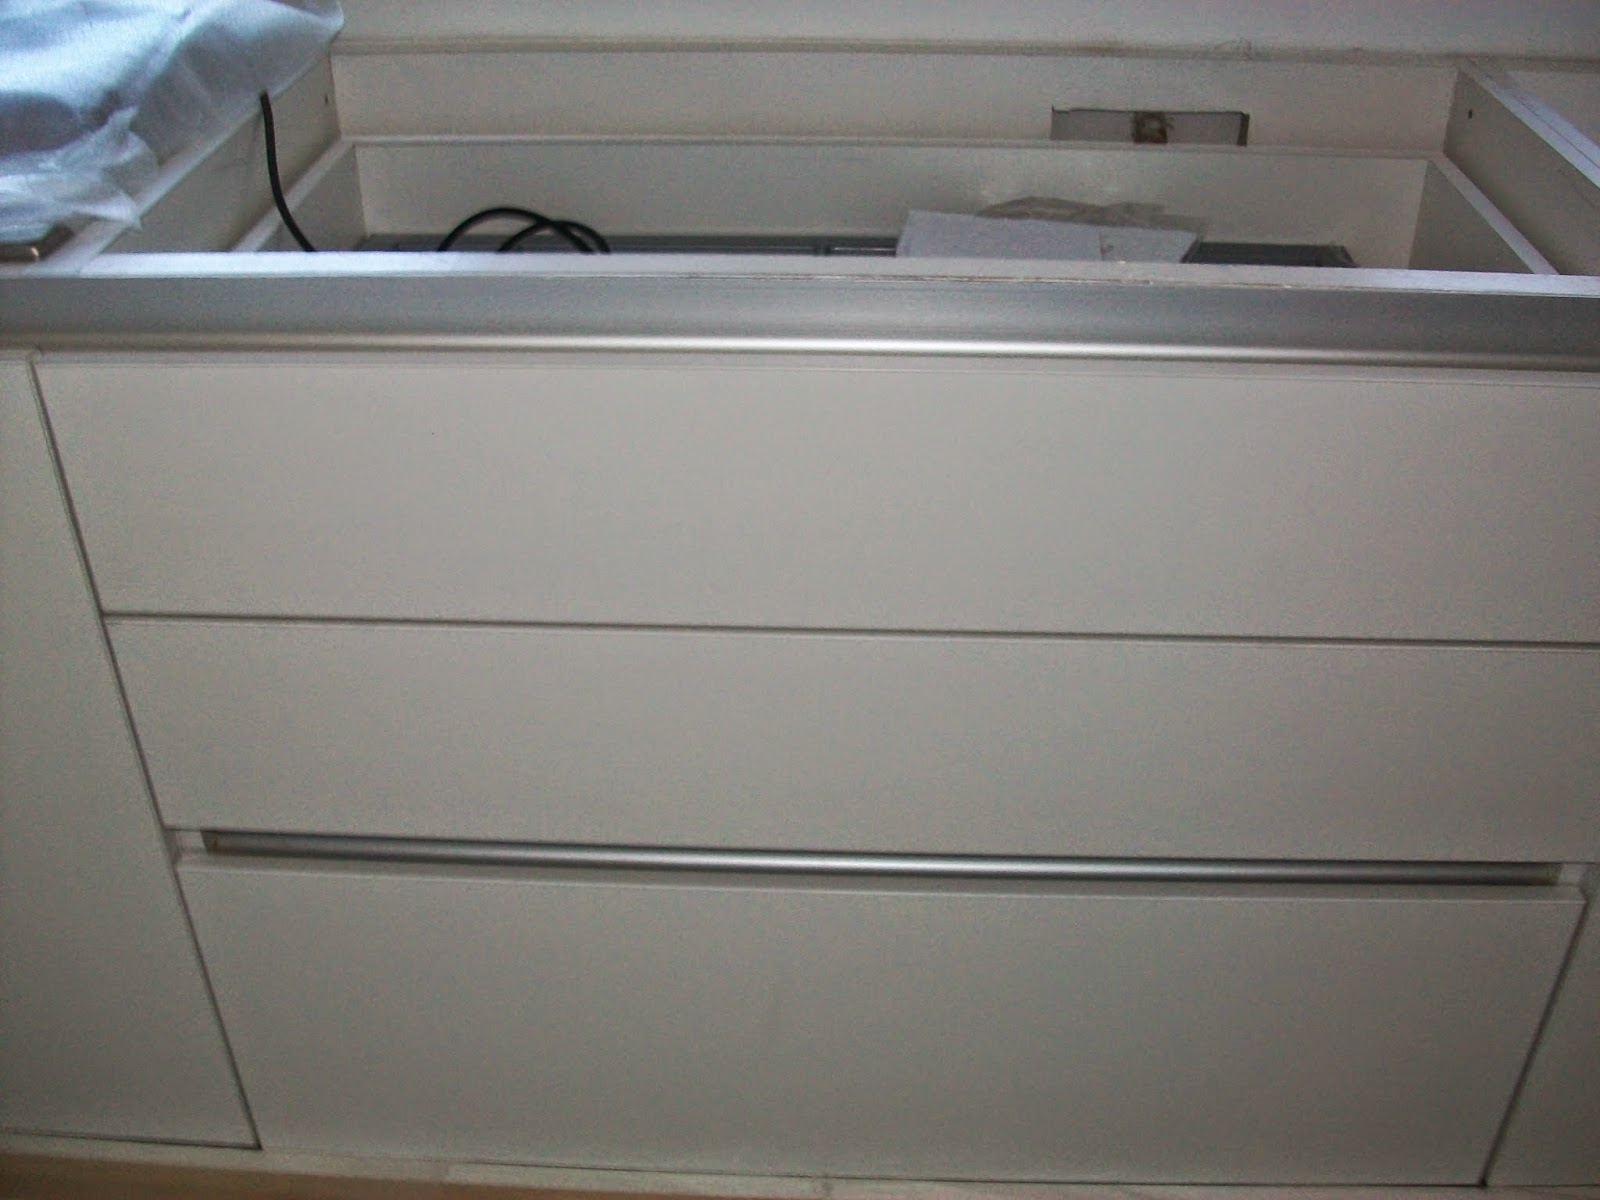 Carpinter a cipresso muebles de cocina for Perfiles aluminio para muebles